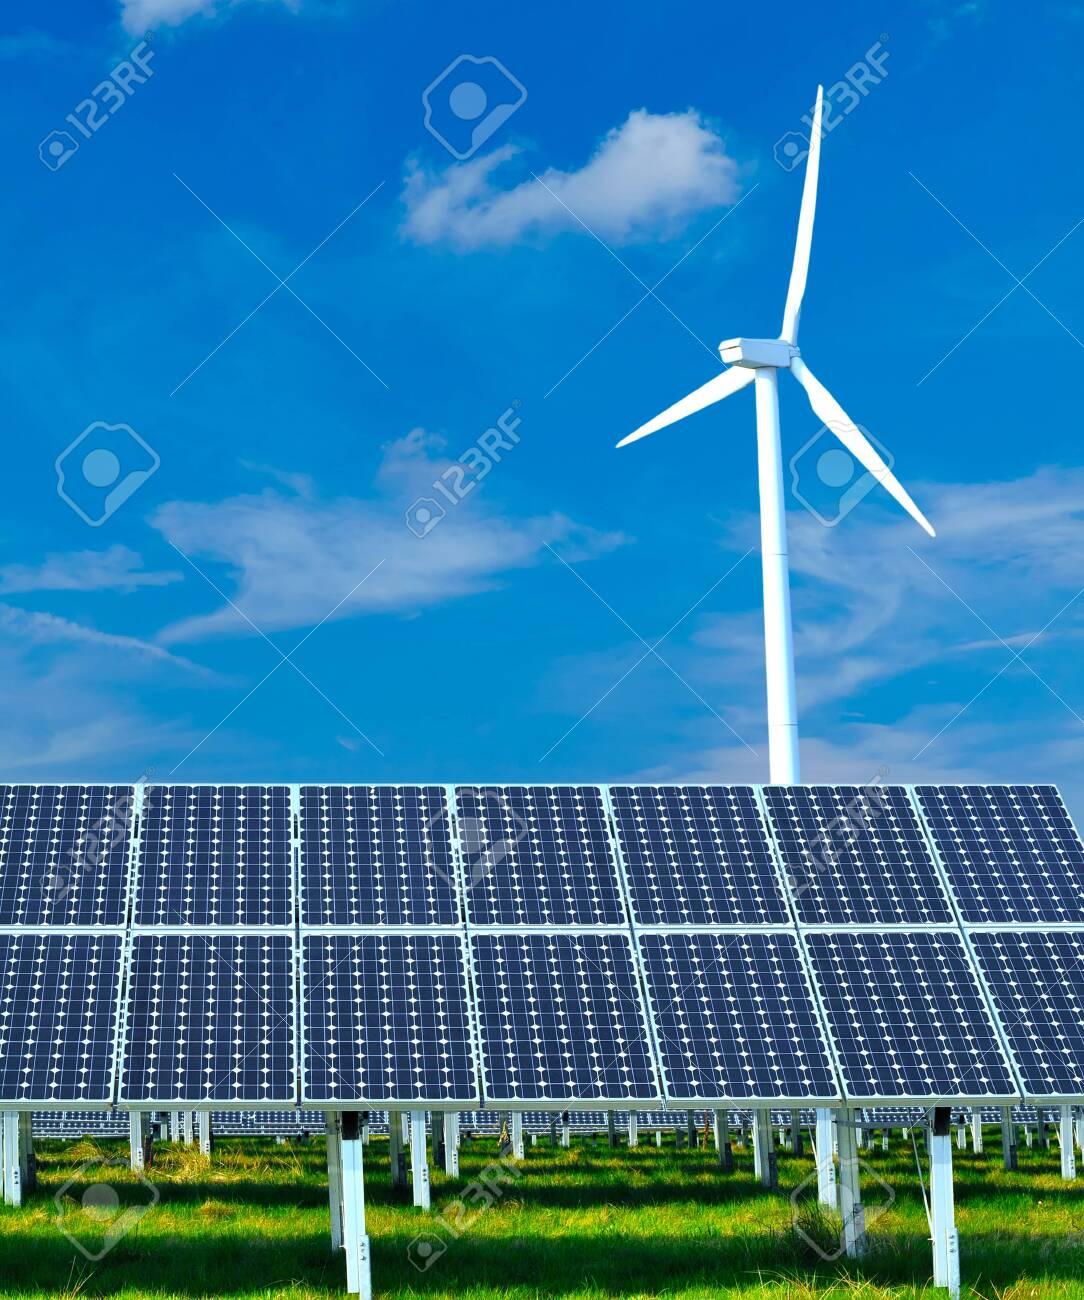 renewable energy generation - wind turbines and solar plants - 148459033